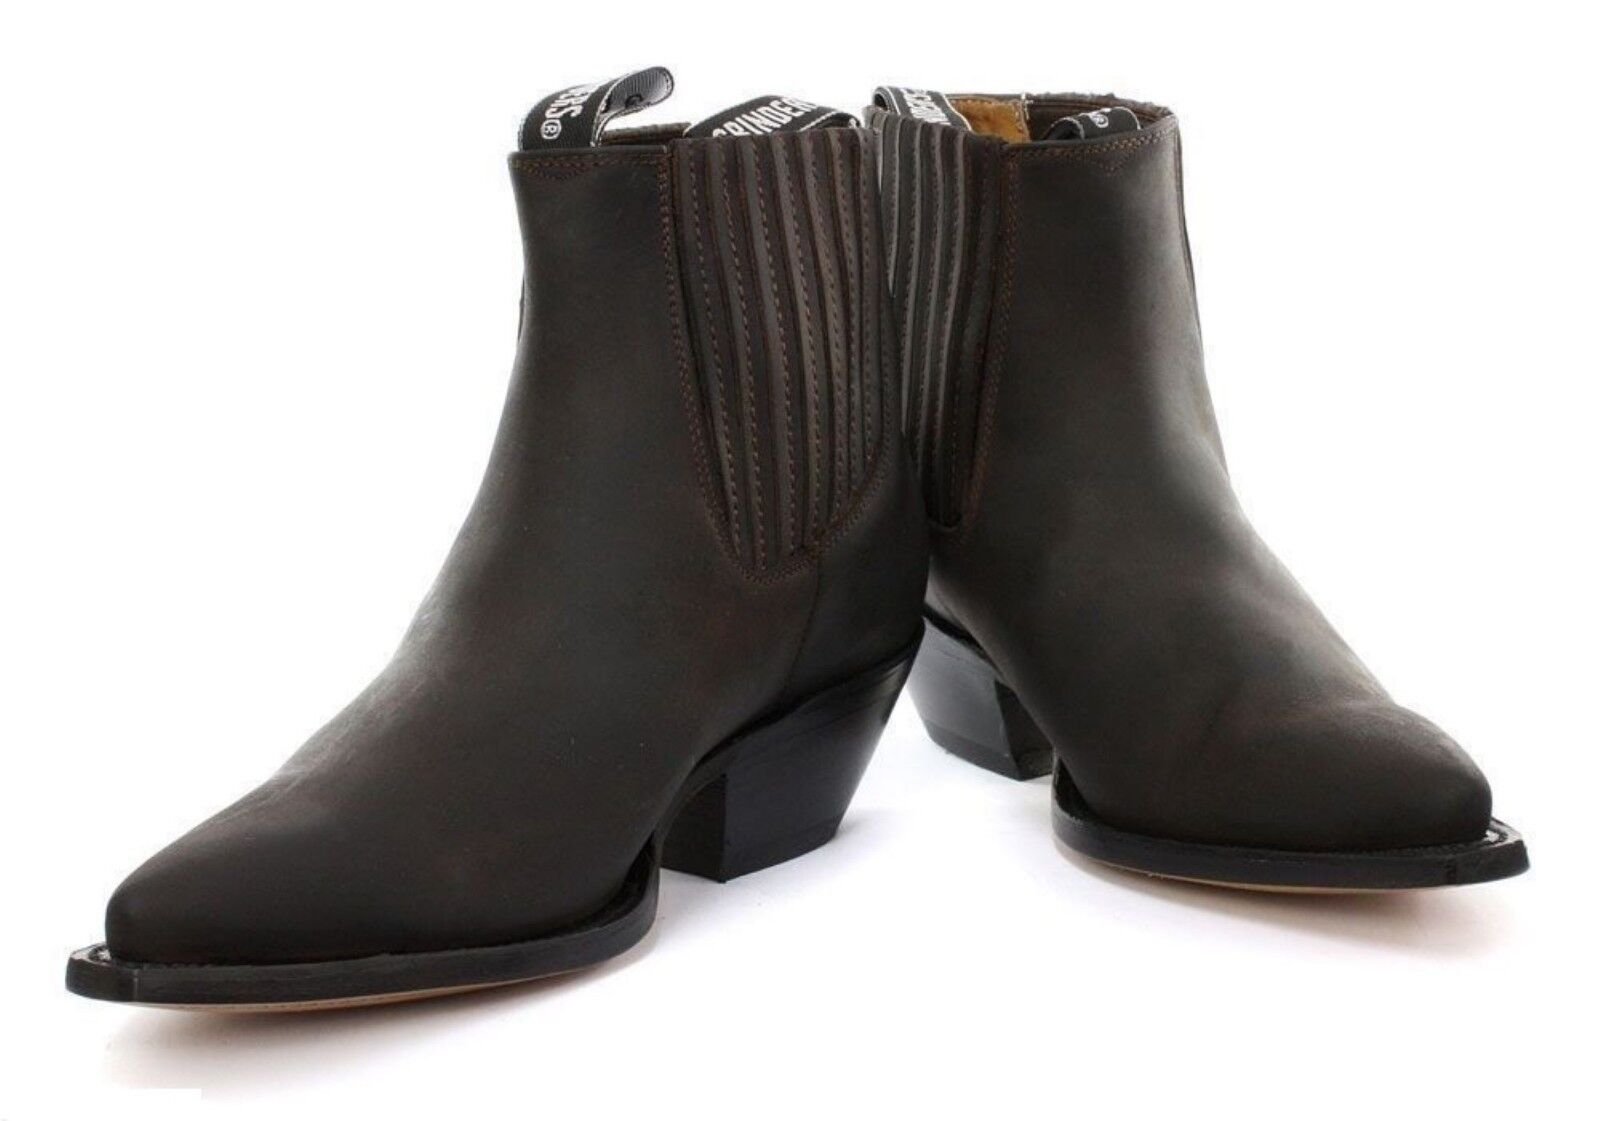 Grinders Mustang Unisesx  Cowboy Western braun Leather Stiefel